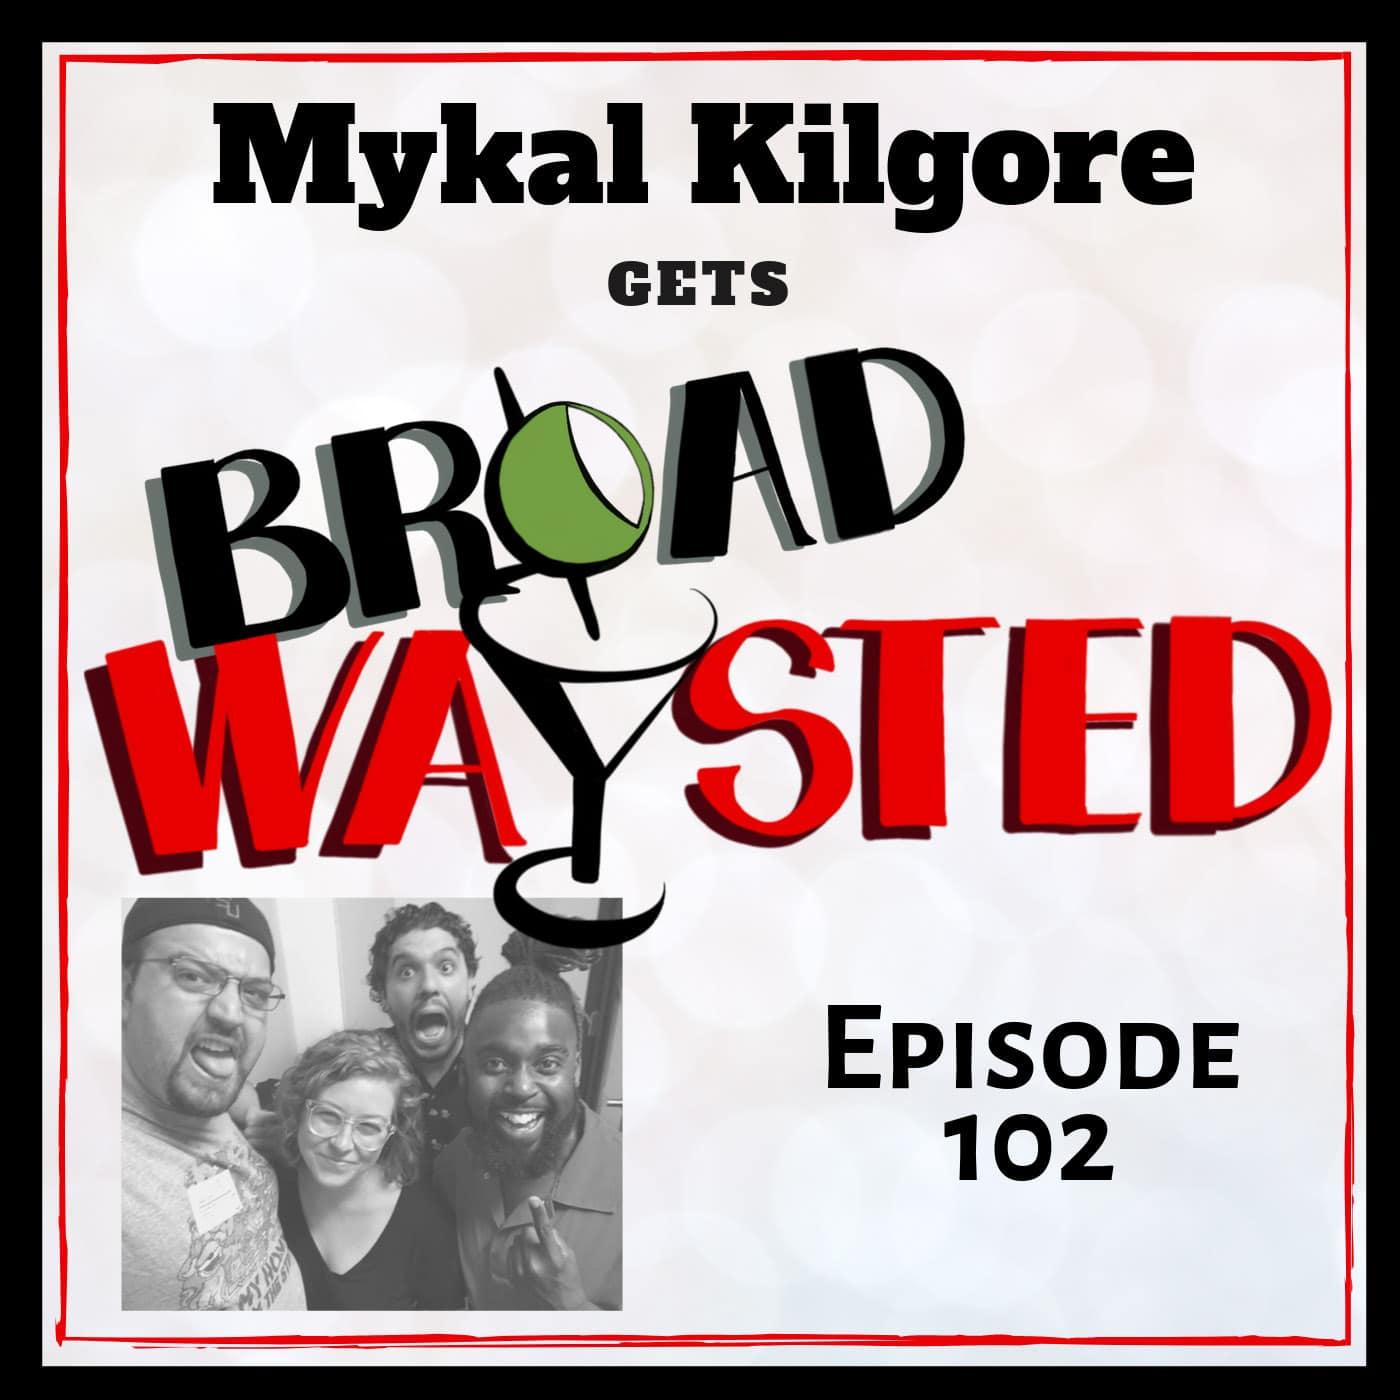 Broadwaysted Ep 102 Mykal Kilgore